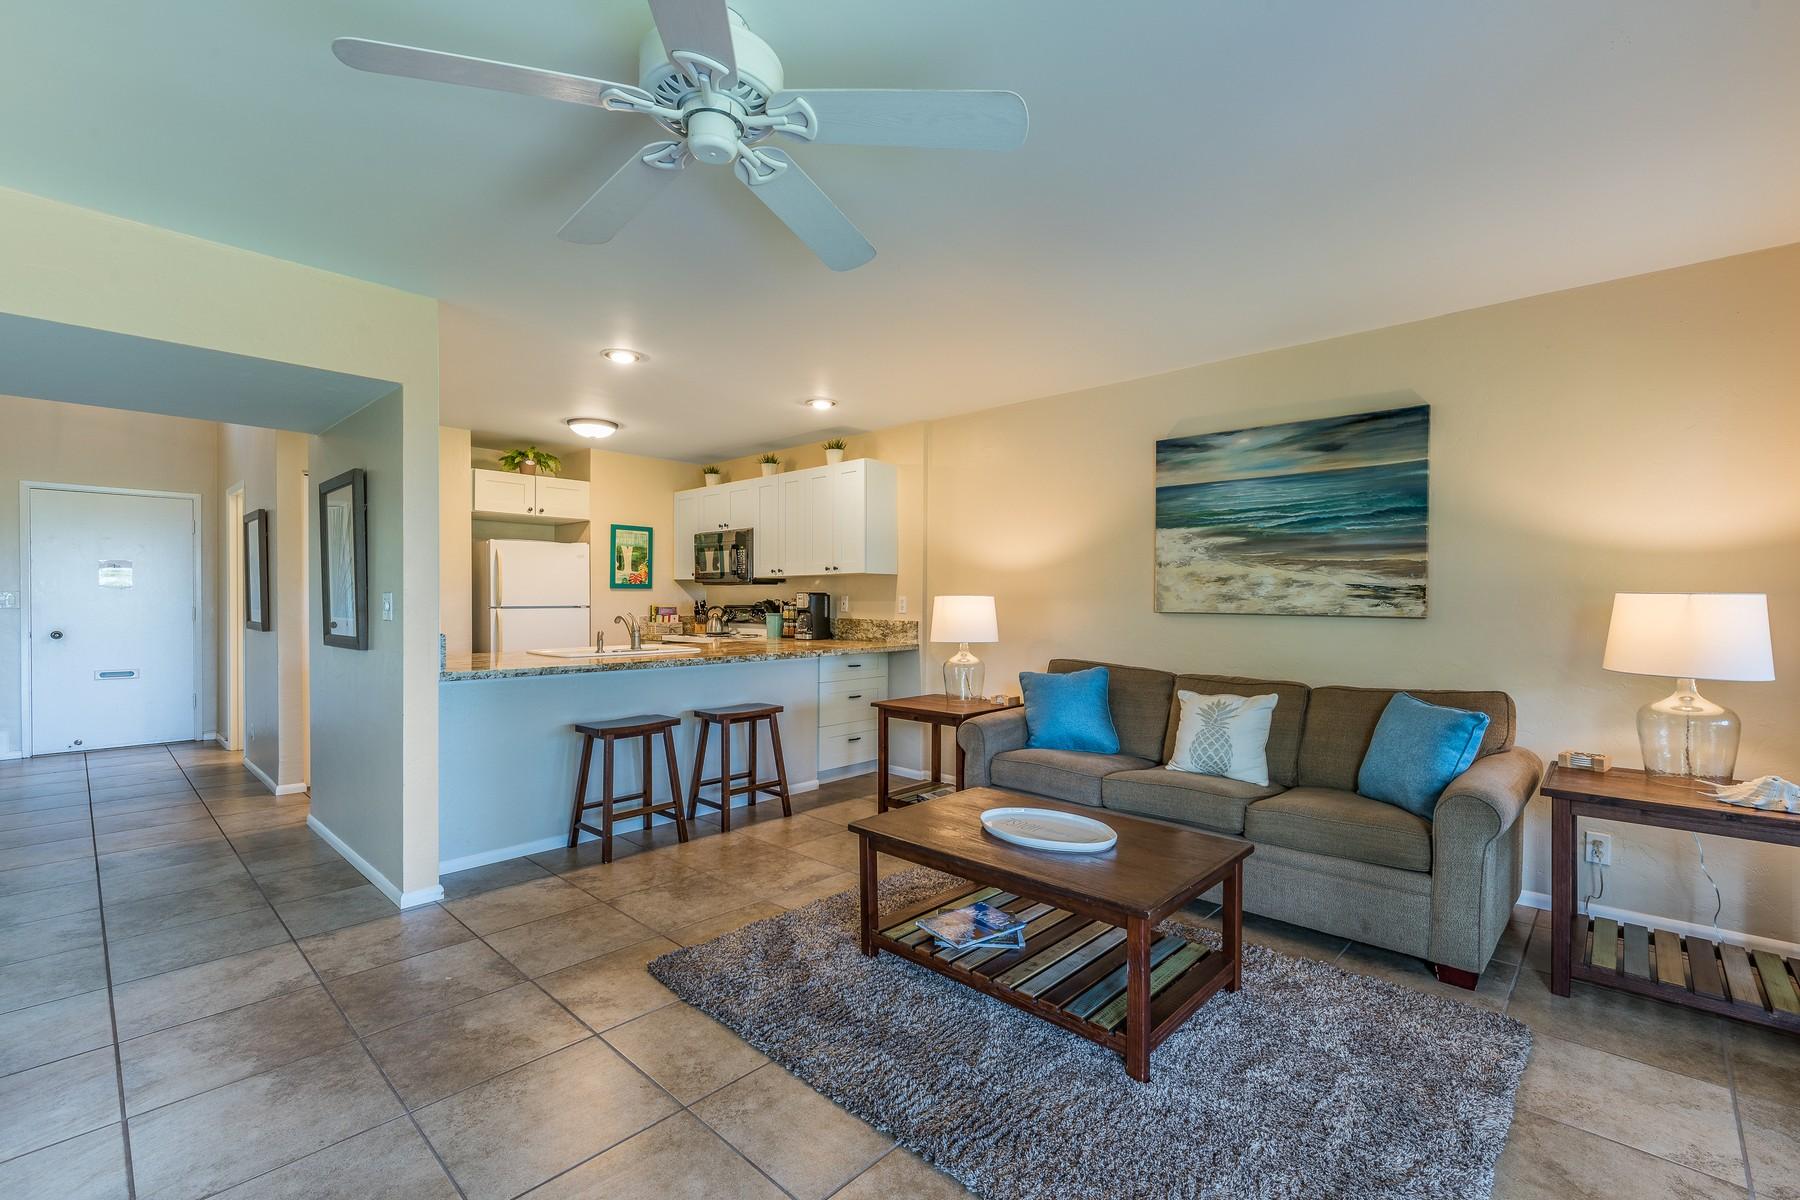 Condominiums for Sale at Welcome to your Hawaiian Hideaway 150 Puukolii Rd, Kaanapali Plantation #59 Lahaina, Hawaii 96761 United States